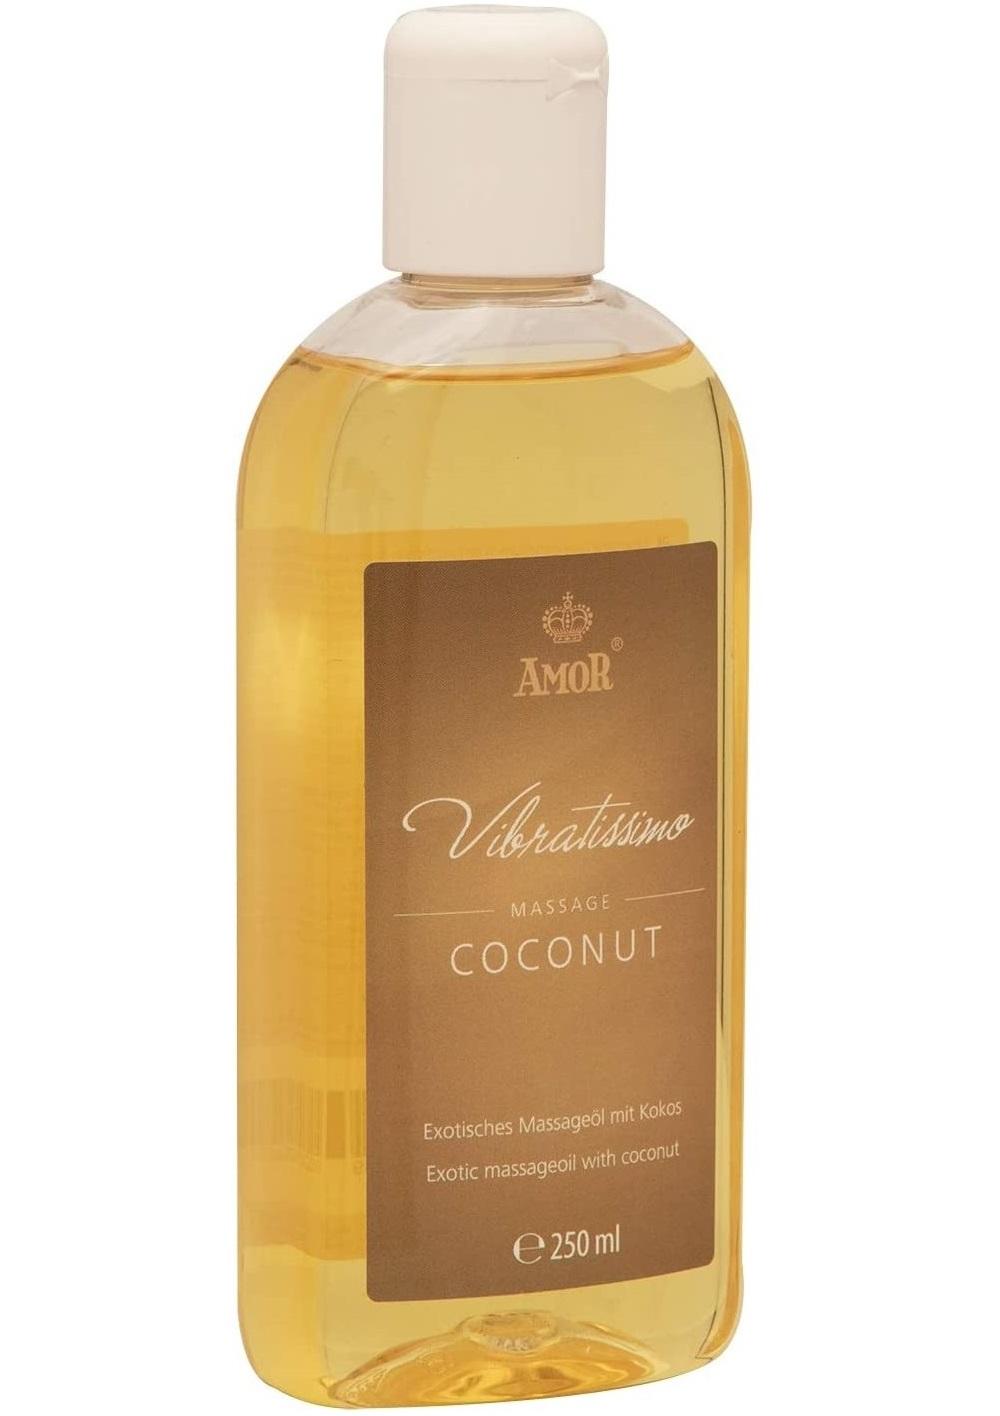 Vibratissimo Exotic massageoil COCONUT-250ml.